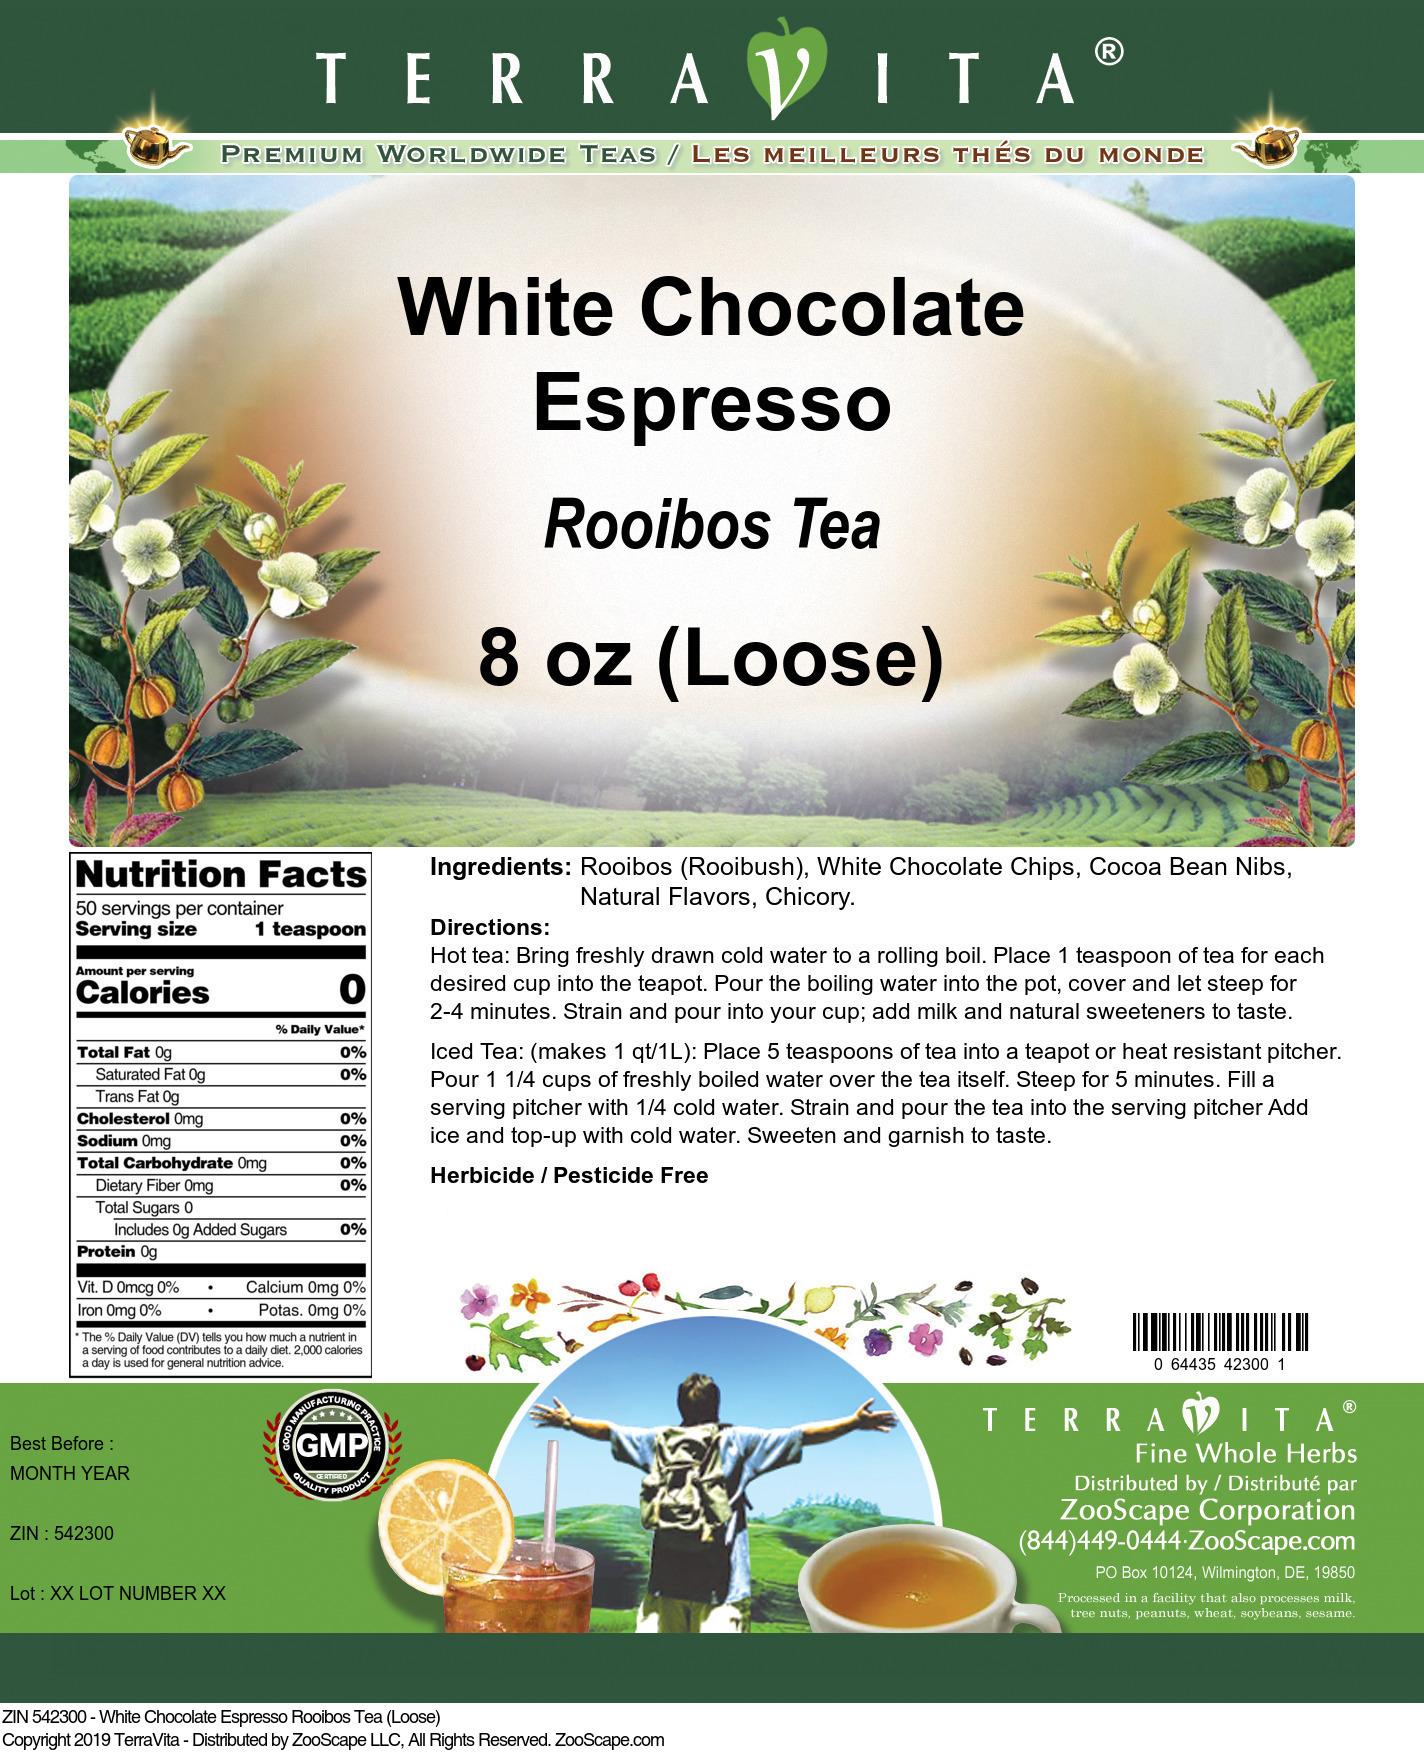 White Chocolate Espresso Rooibos Tea (Loose)